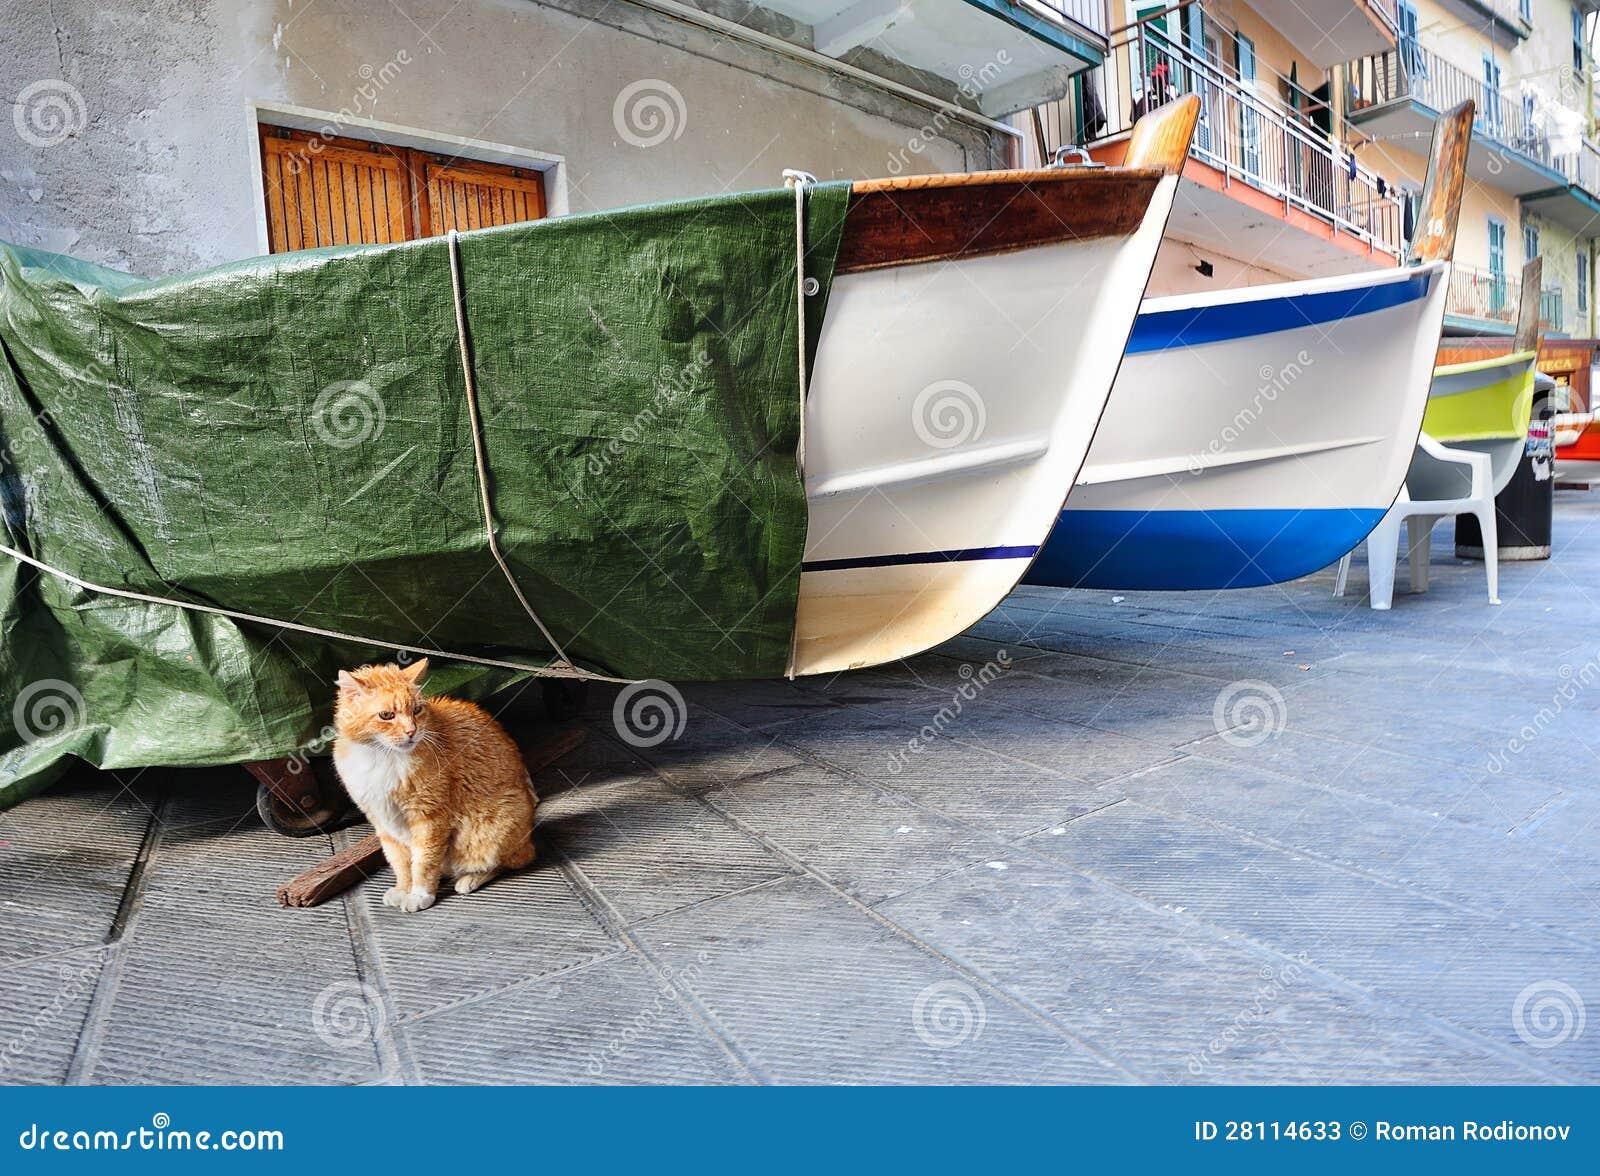 bow legged cat